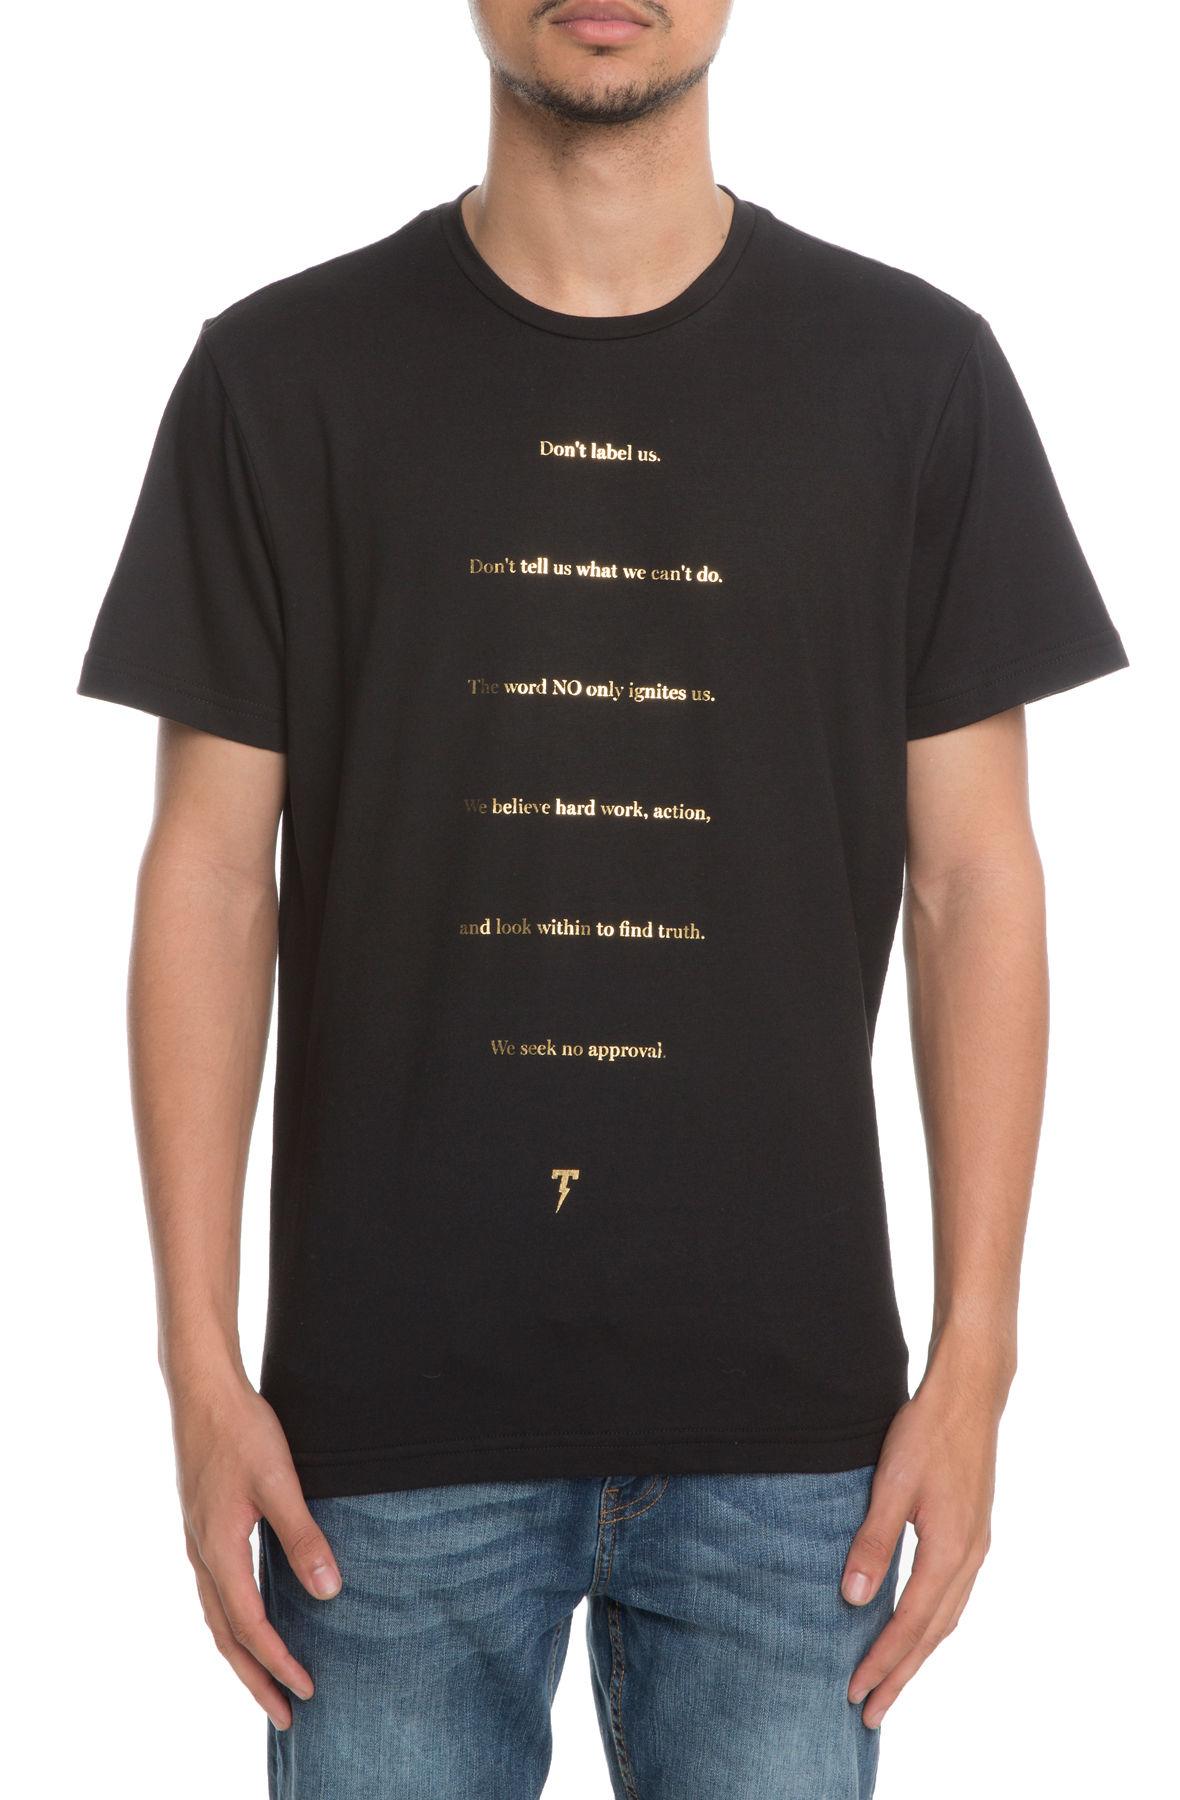 Image of The Manifesto Short Sleeve Tee in Black